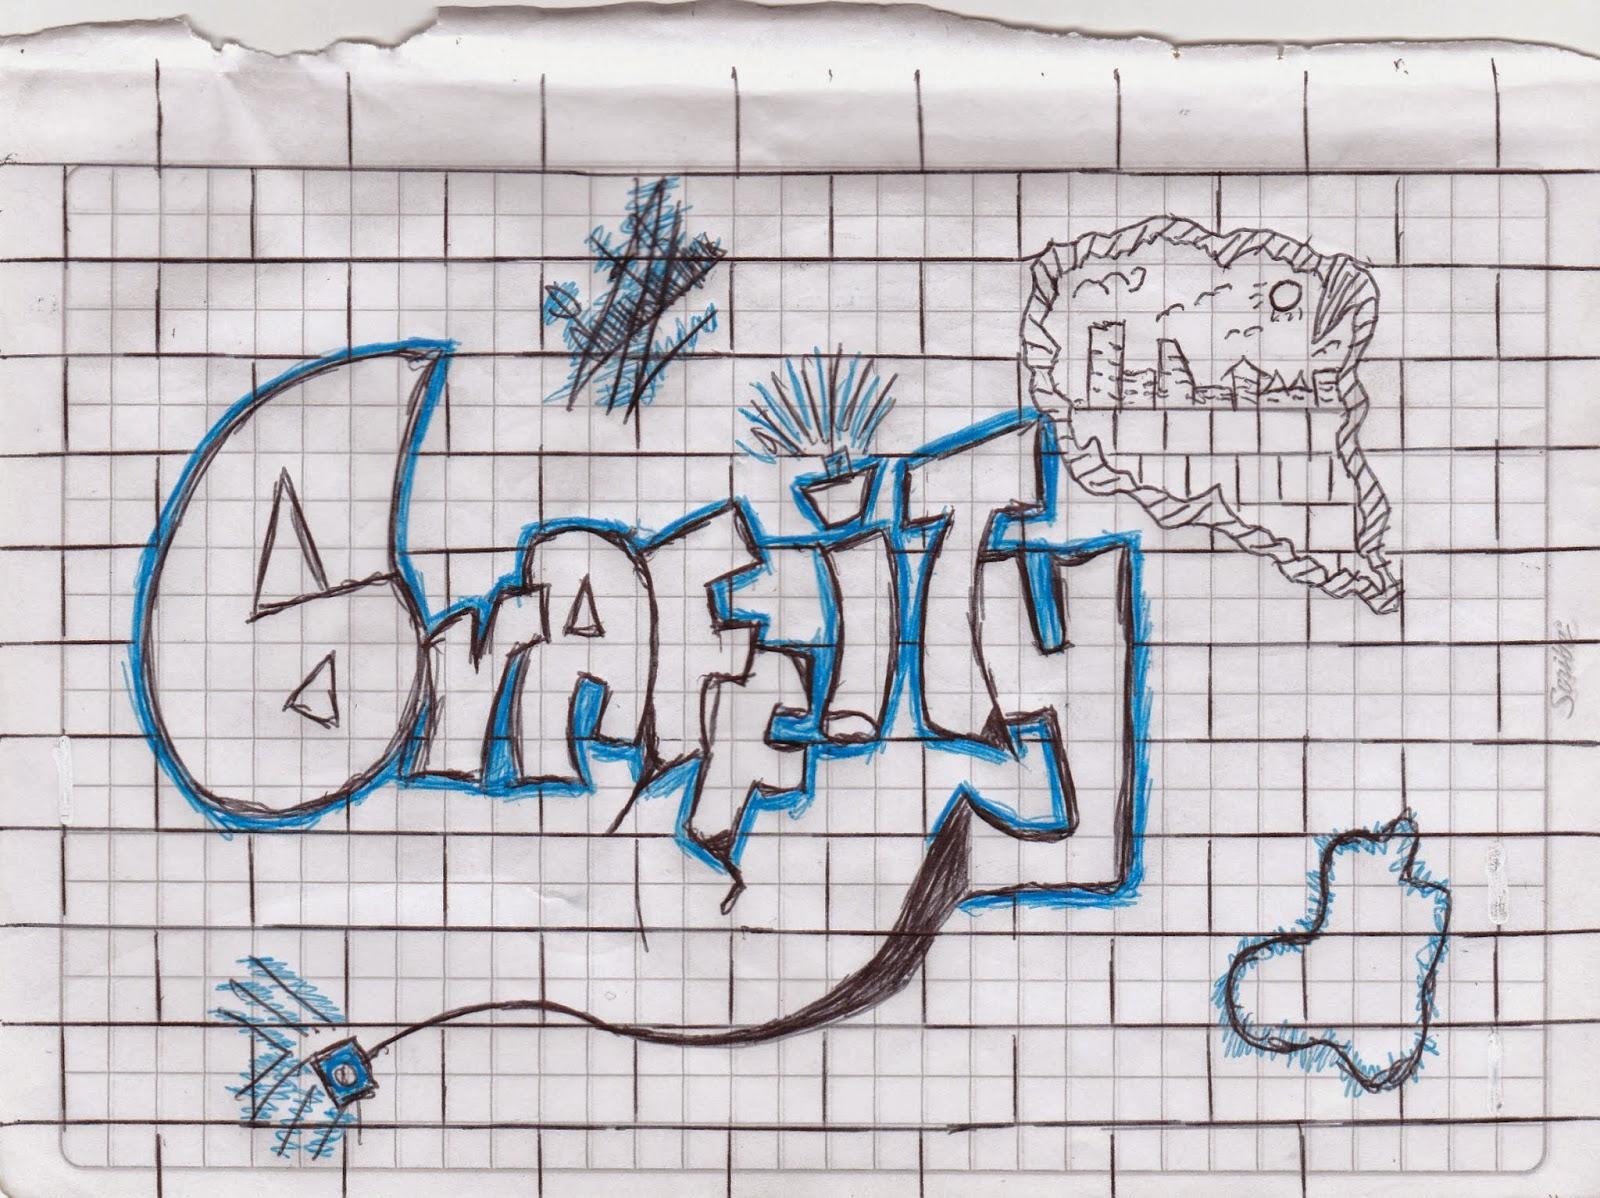 Dibujos Graffitis Dibujo Graffiti